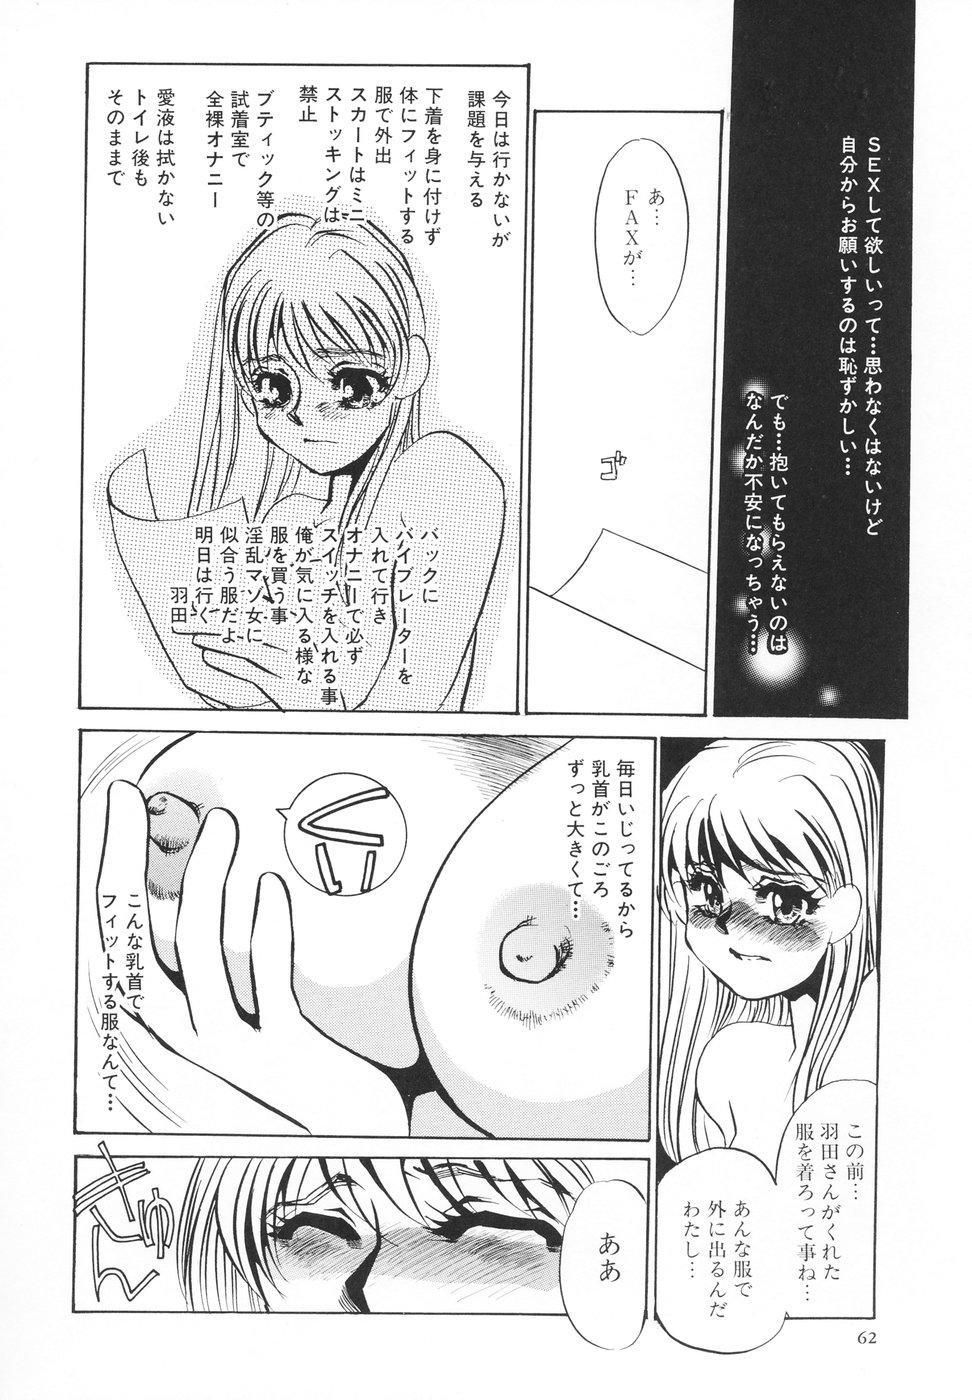 Hentai Inran 62